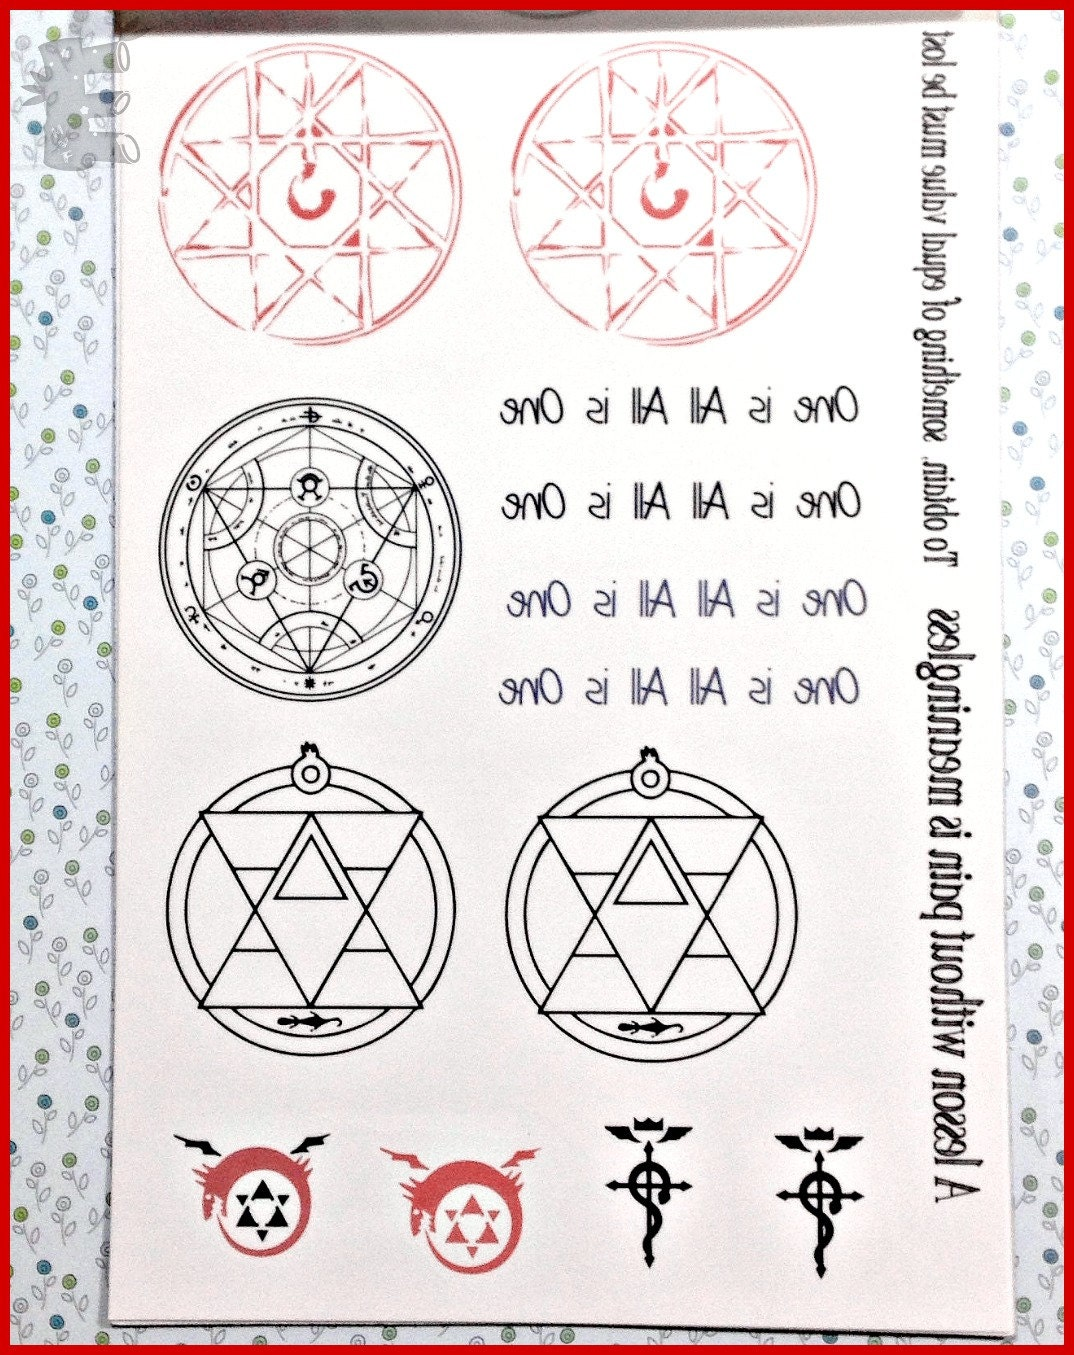 Fma blood seal temporary tattoo and bonus alchemy symbols and zoom biocorpaavc